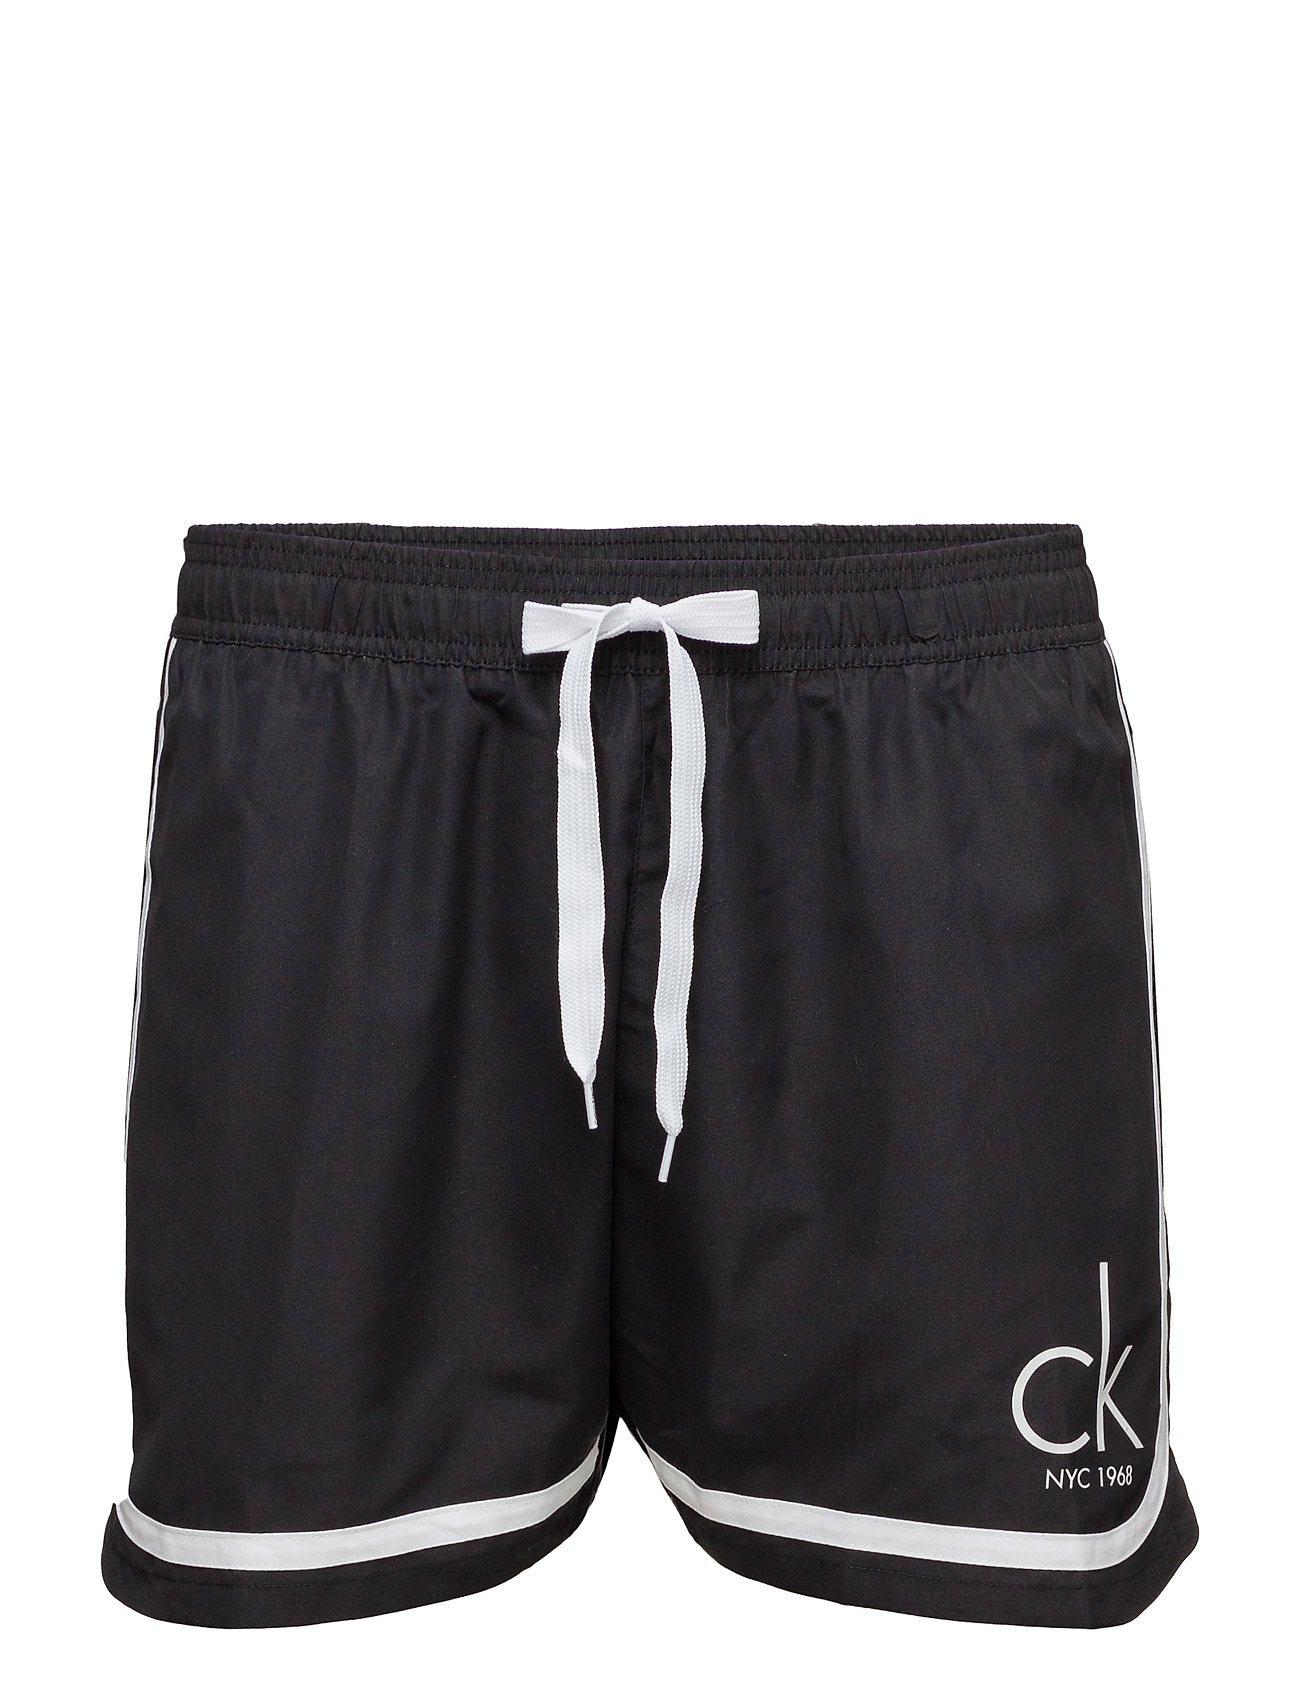 Retro Medium Drawstr Calvin Klein Bermuda shorts til Herrer i Sort